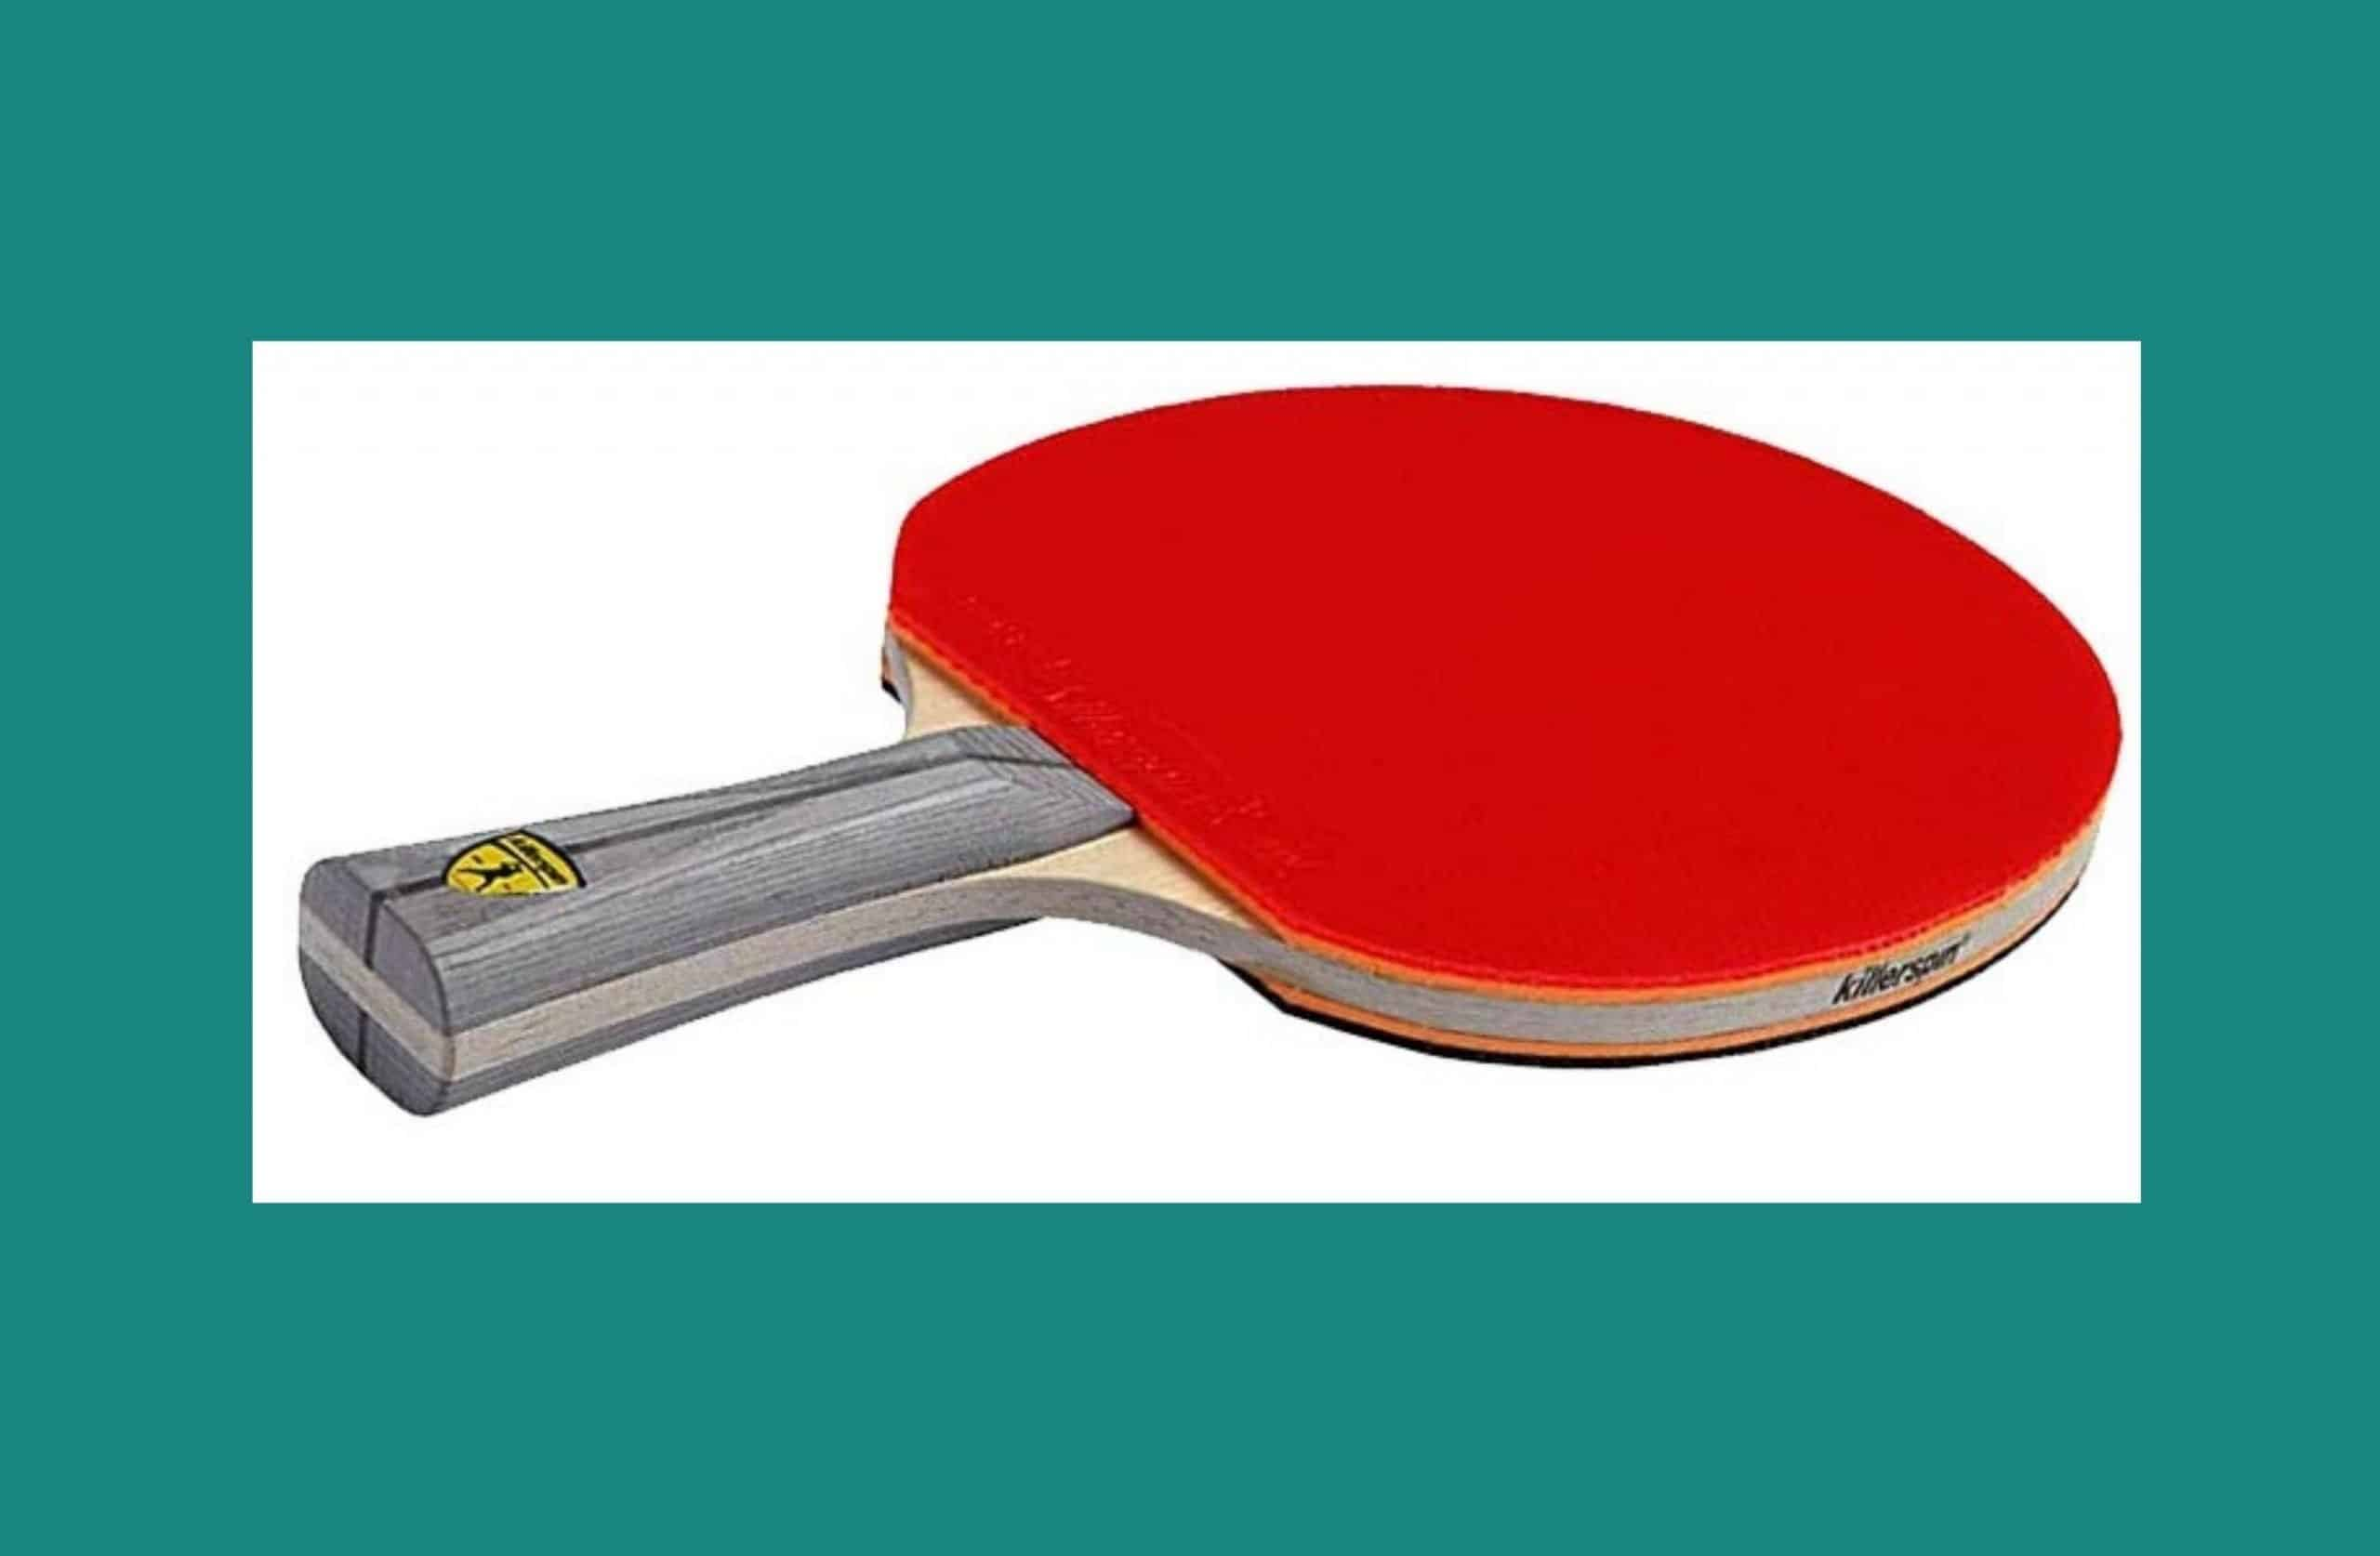 Killerspin Jet 600 Table Tennis Paddle